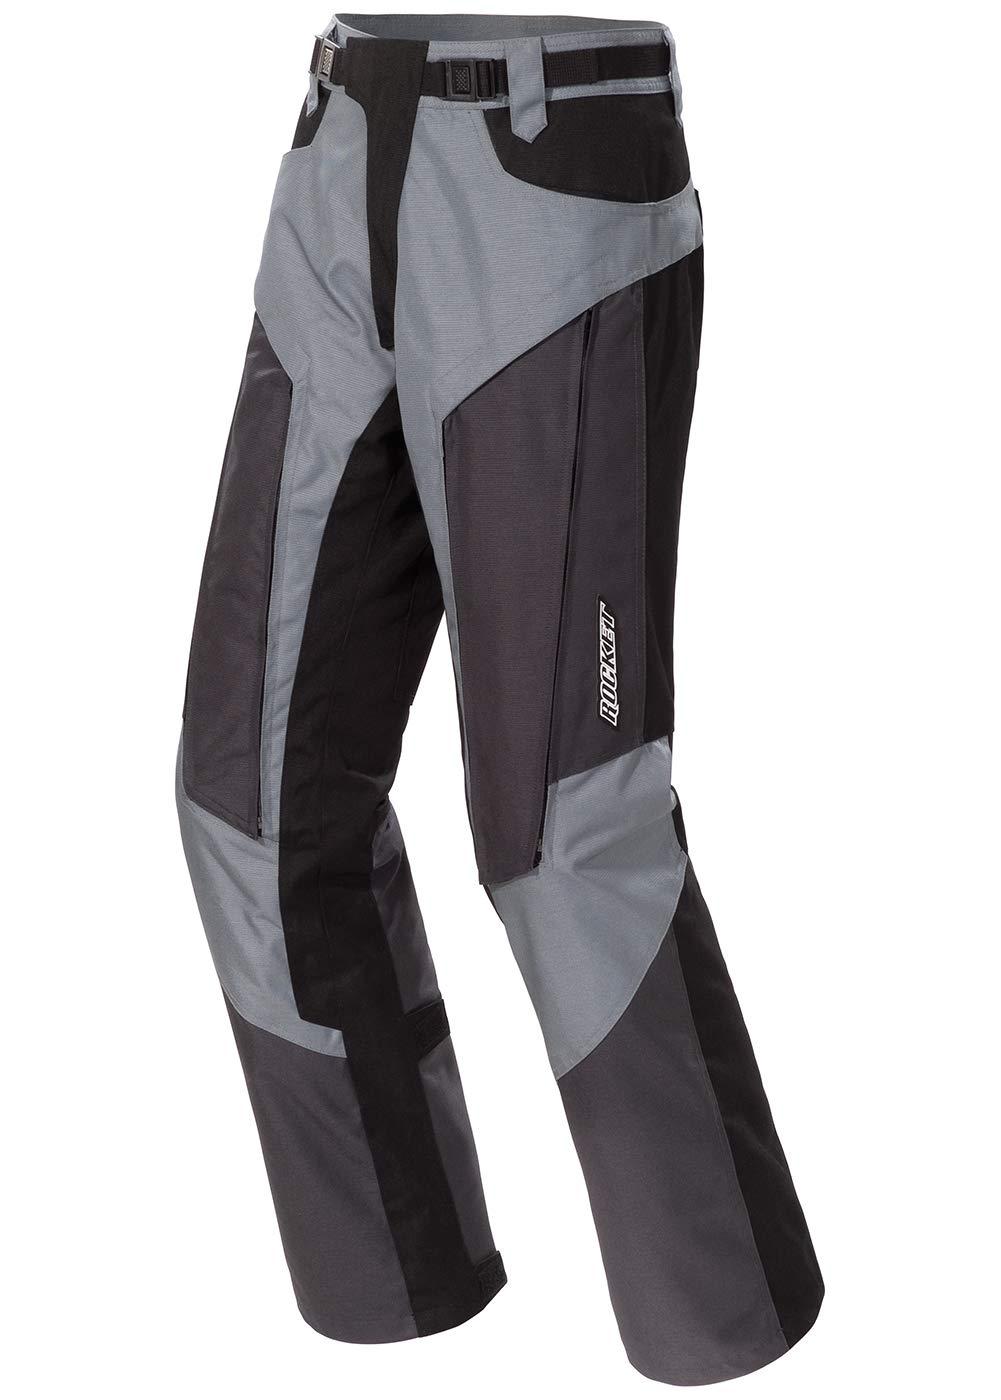 Joe Rocket Atomic Men's Textile Pants (Black, Large) 8054-1004